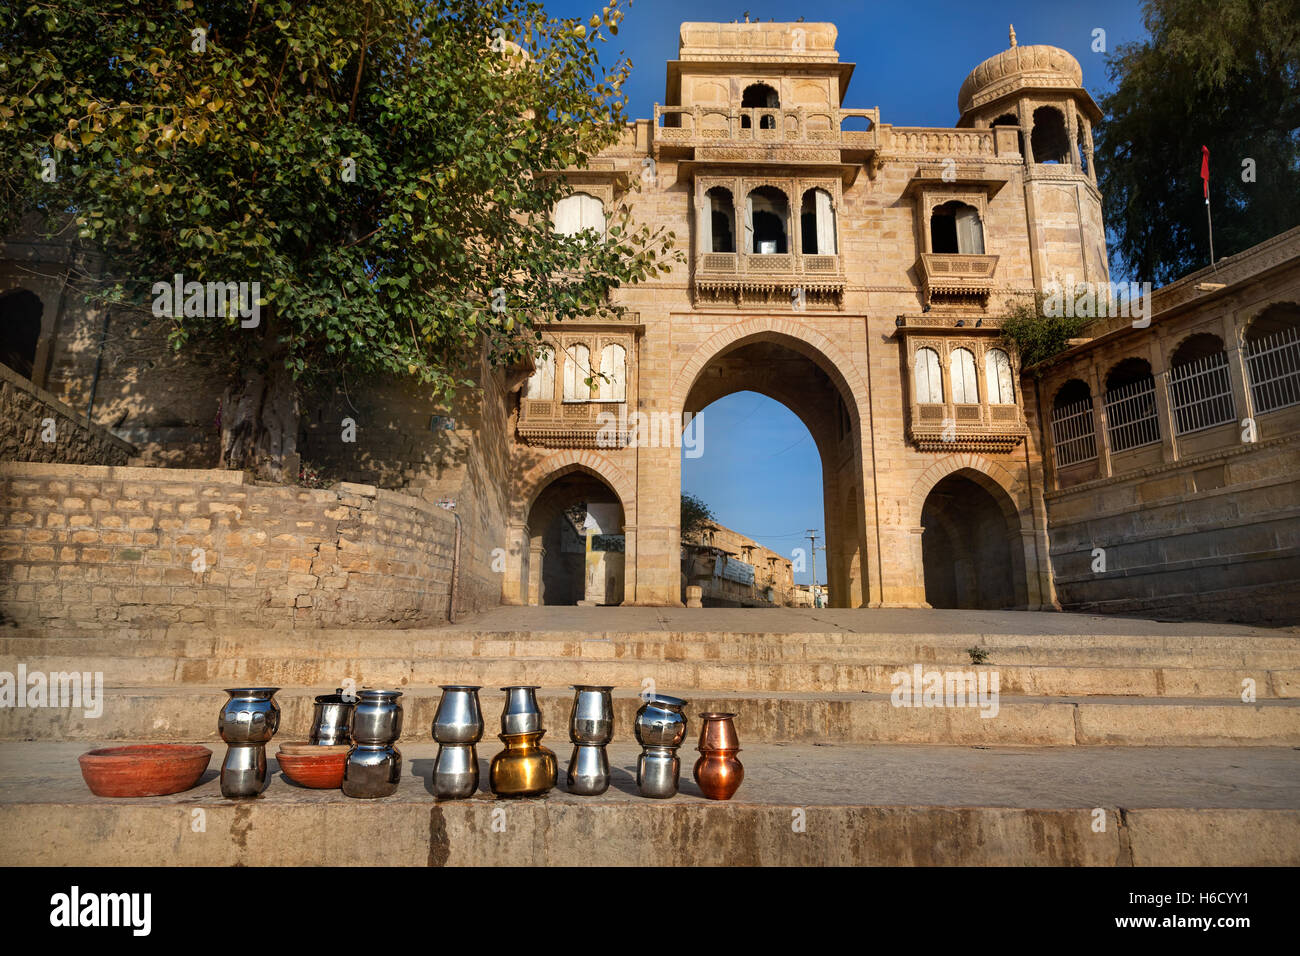 Temple Arch near the Gadi Sagar Lake and ritual iron pots in Jaisalmer, Rajasthan, India Stock Photo